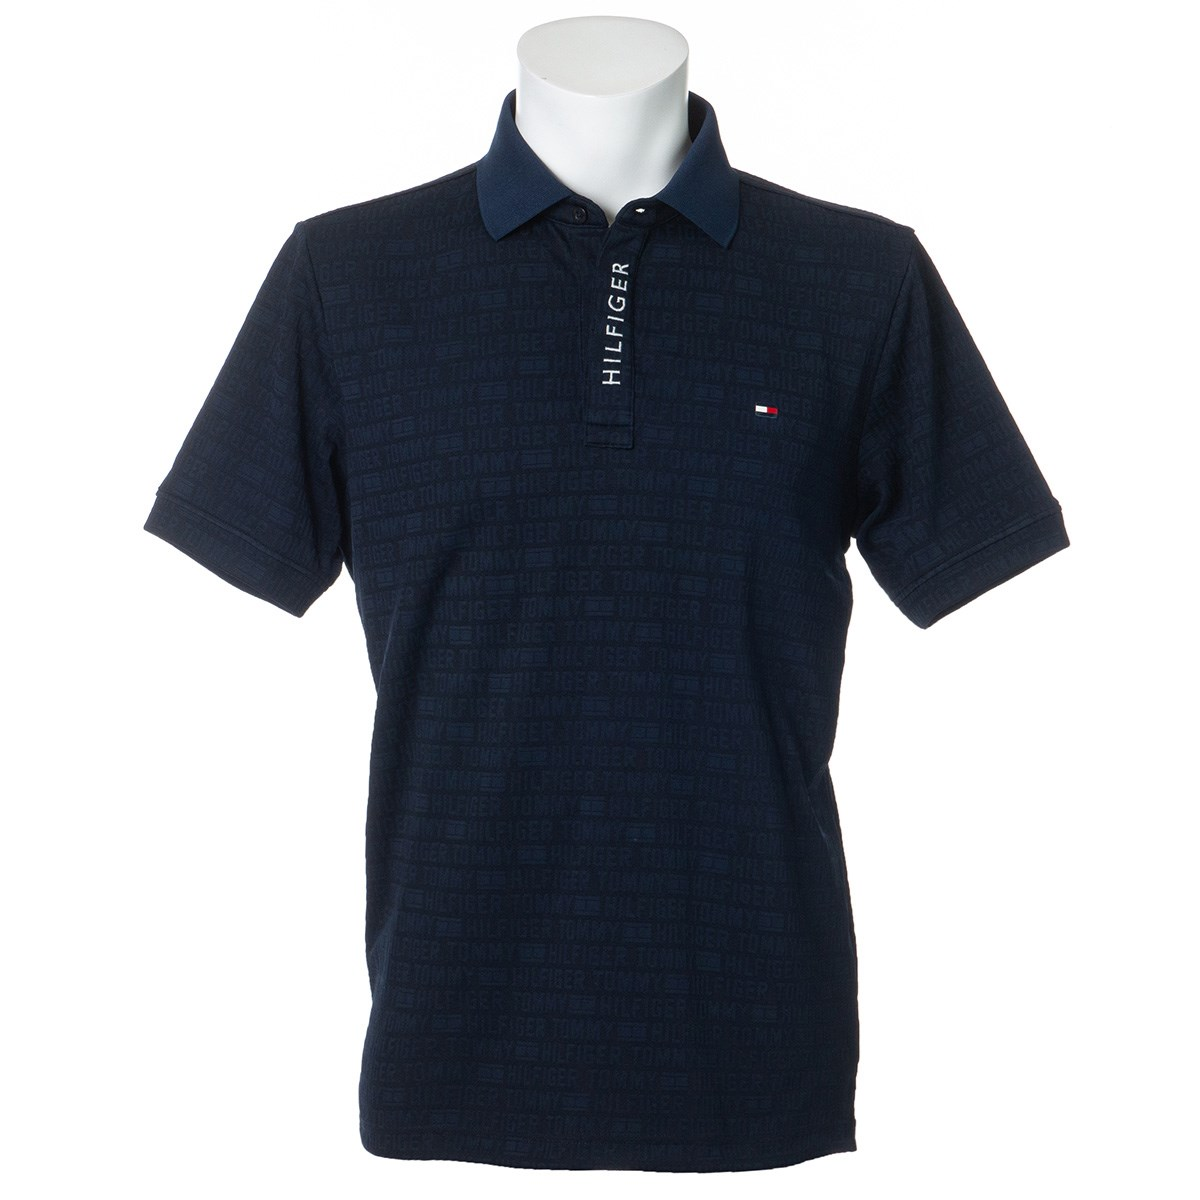 [40%OFF 秋冬クリアランスセール] トミー ヒルフィガー ゴルフ ロゴジャカード半袖ポロシャツ ネイビー 30 メンズ ゴルフウェア